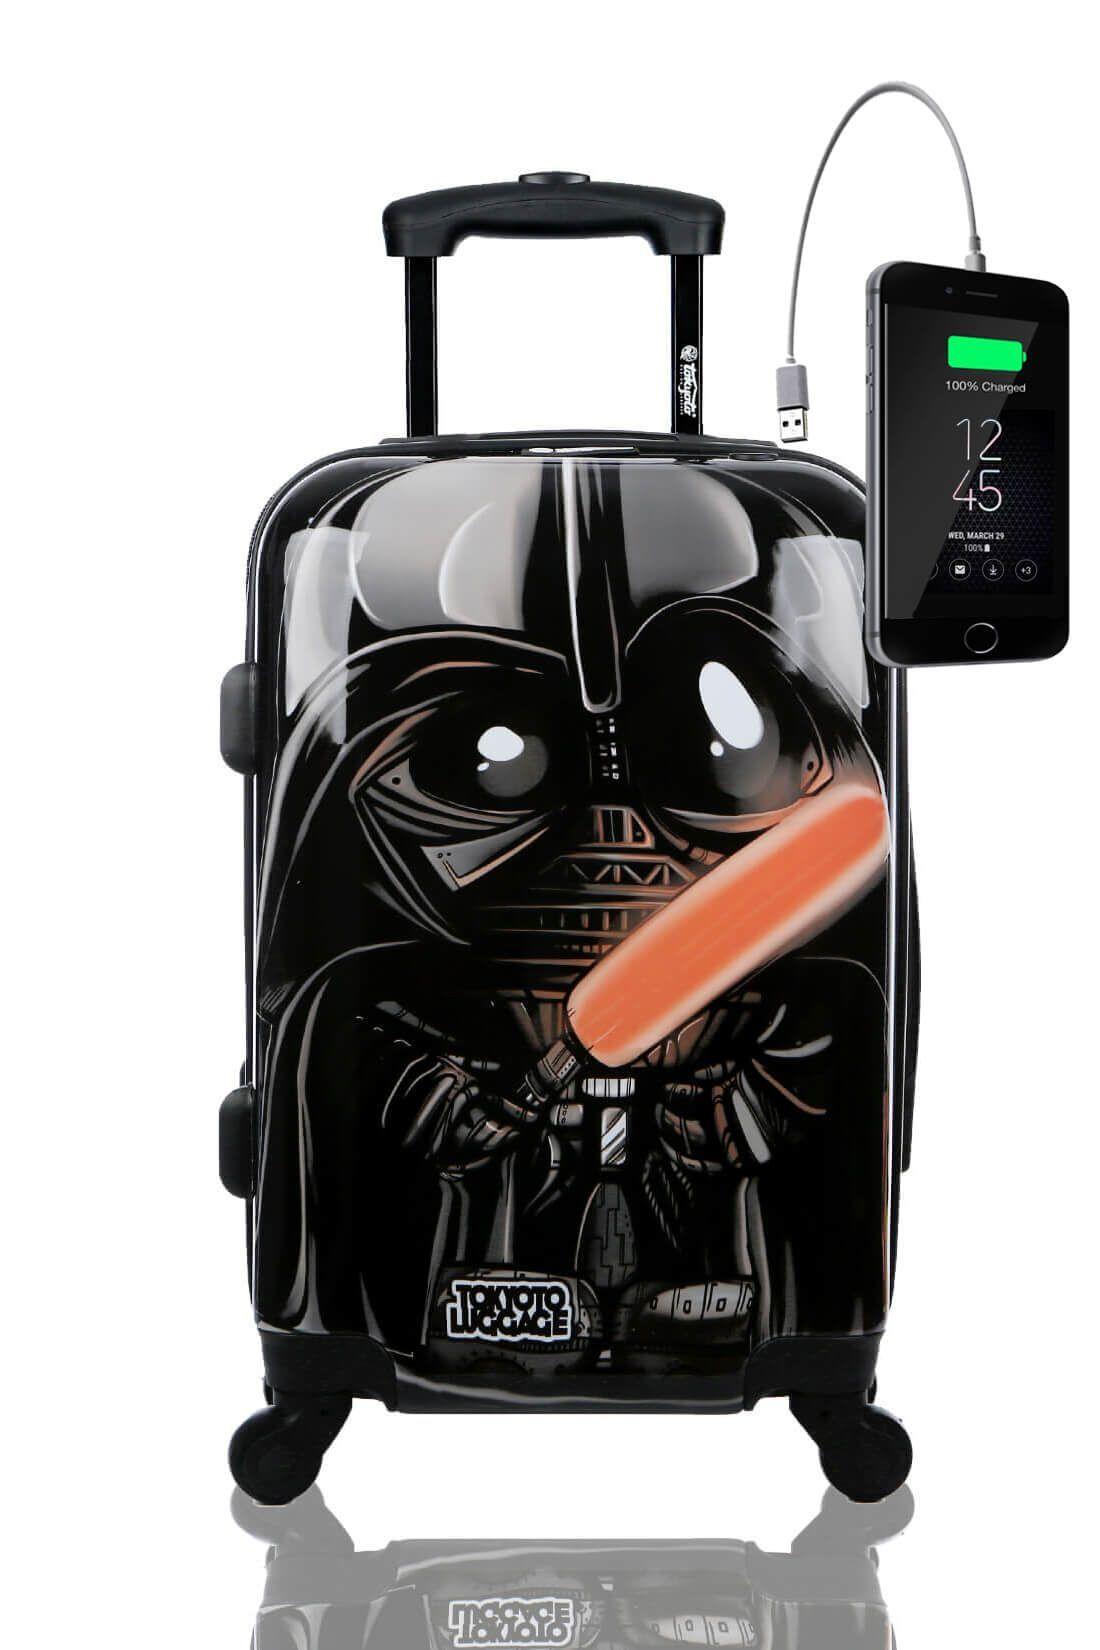 Kids Hand Trolley Cabin Luggage Suitcase Online Powerbank USB TOKYOTO BLACK EMPIRE